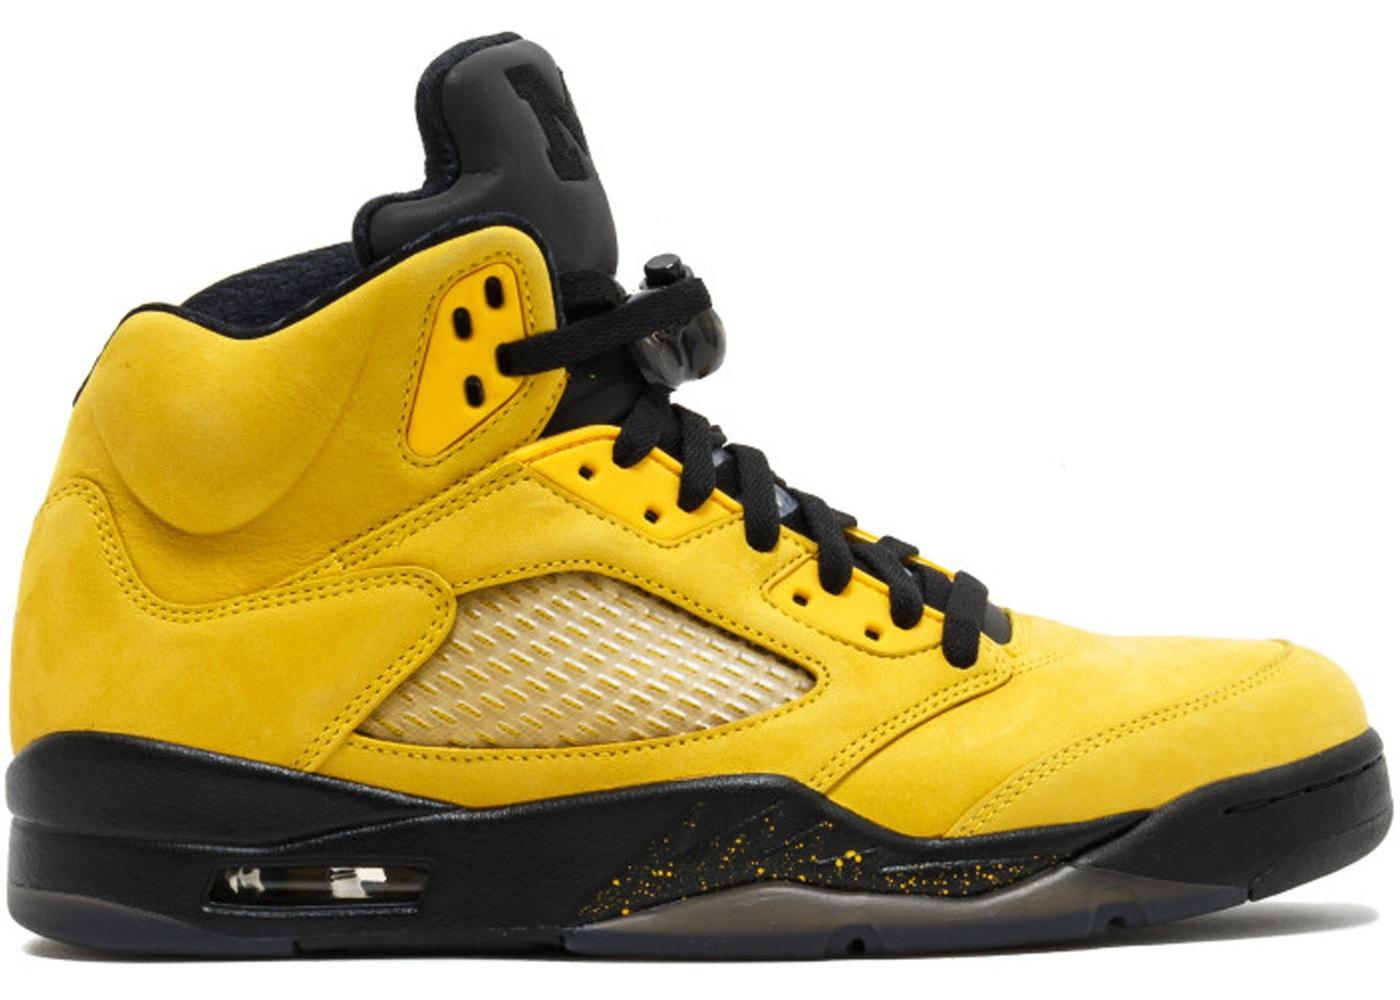 b2b2f87a6470 Air Jordan Shoes - Average Sale Price